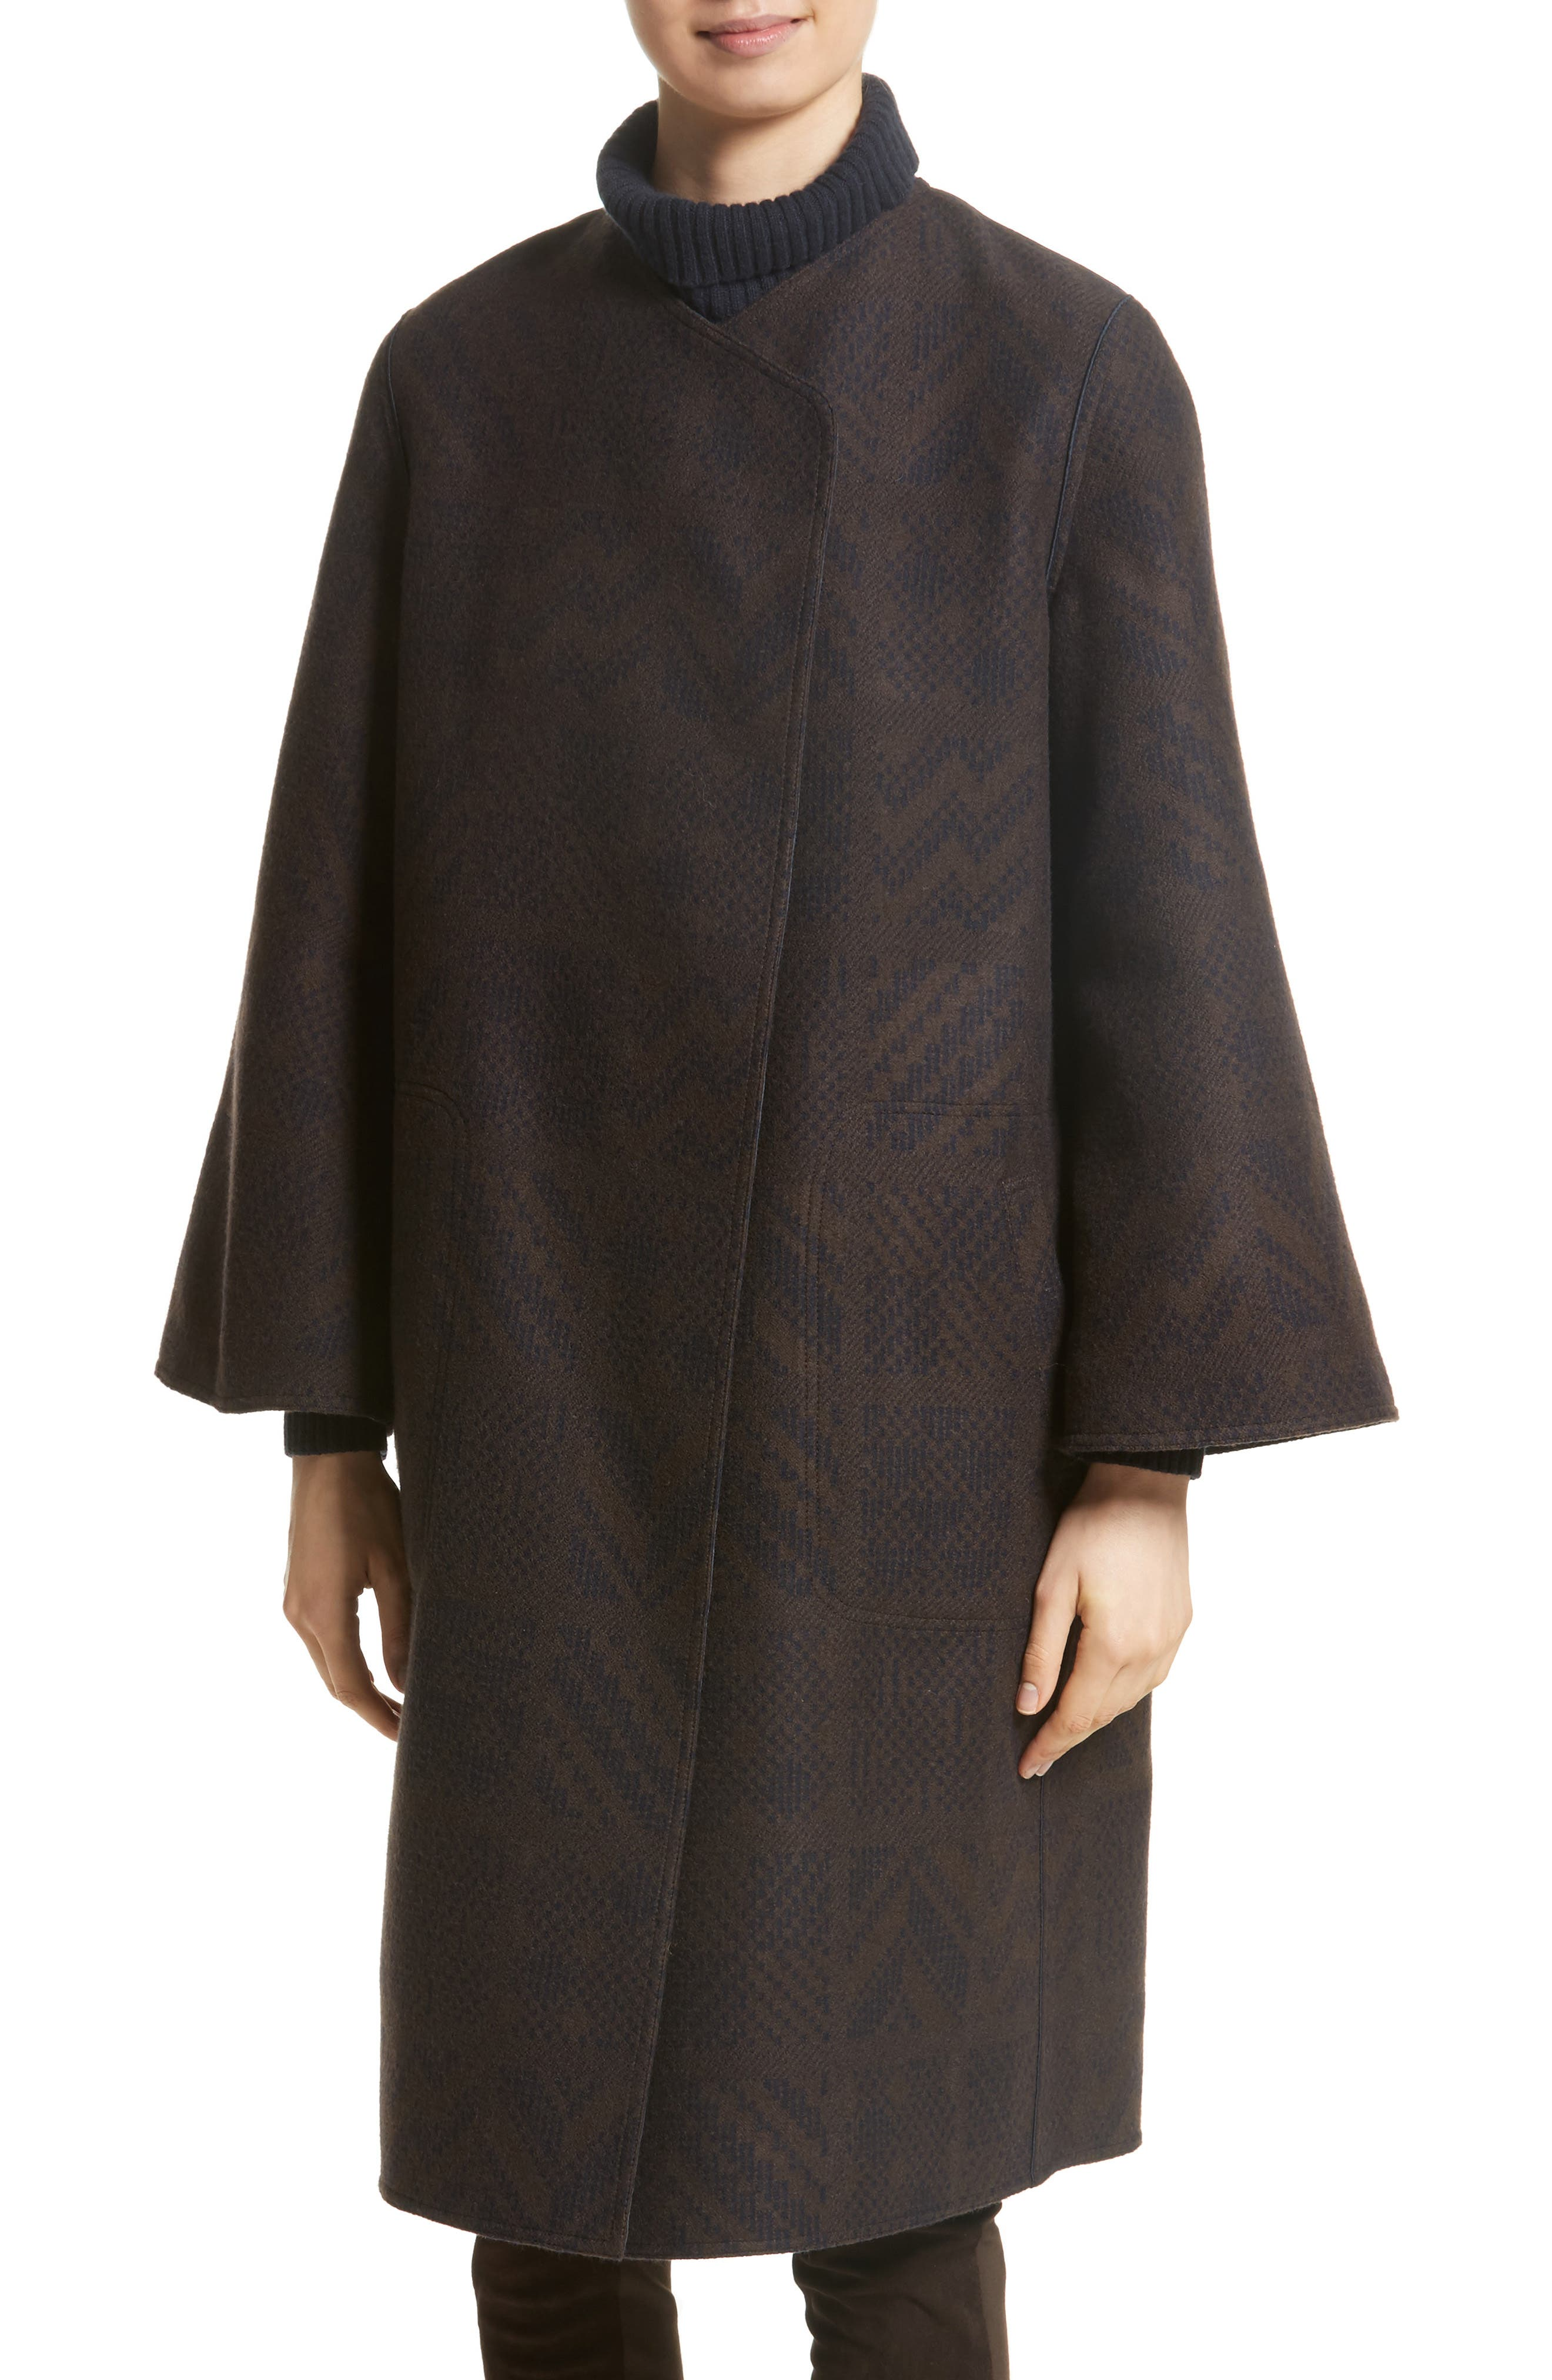 McCall Reversible Coat,                             Alternate thumbnail 2, color,                             438